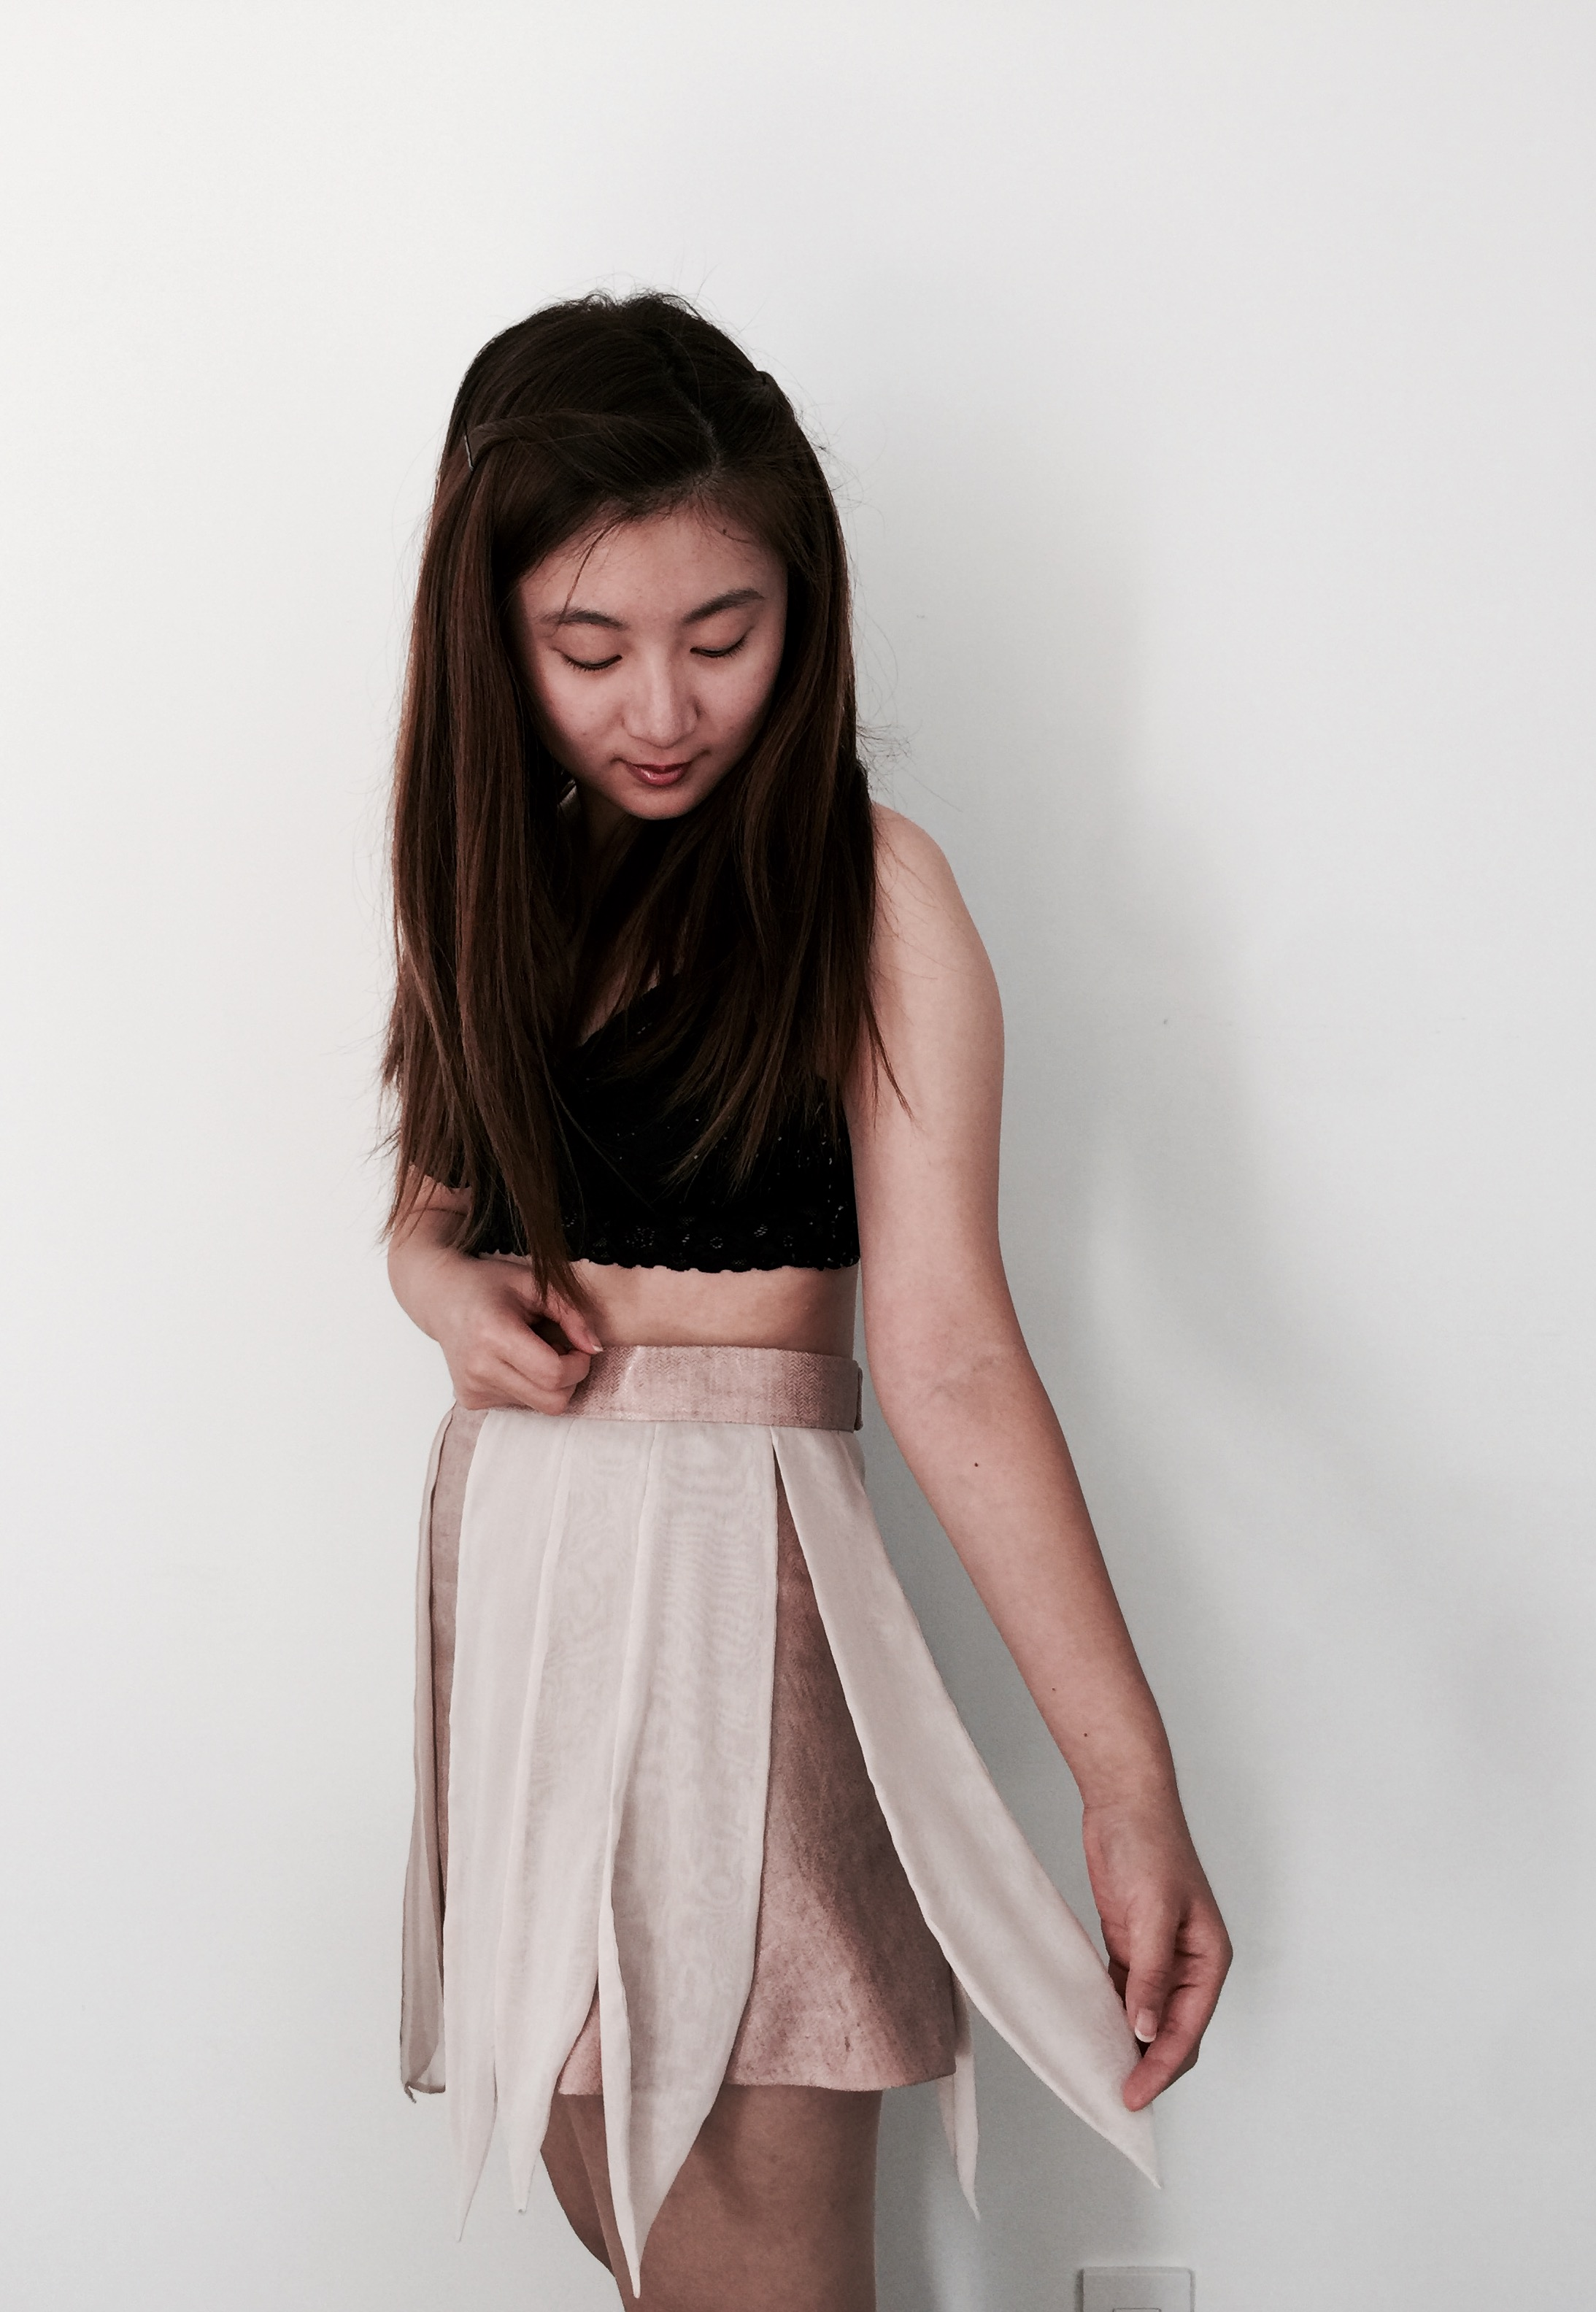 Original Skirt Design Process + Basic Finished Skirt Photos